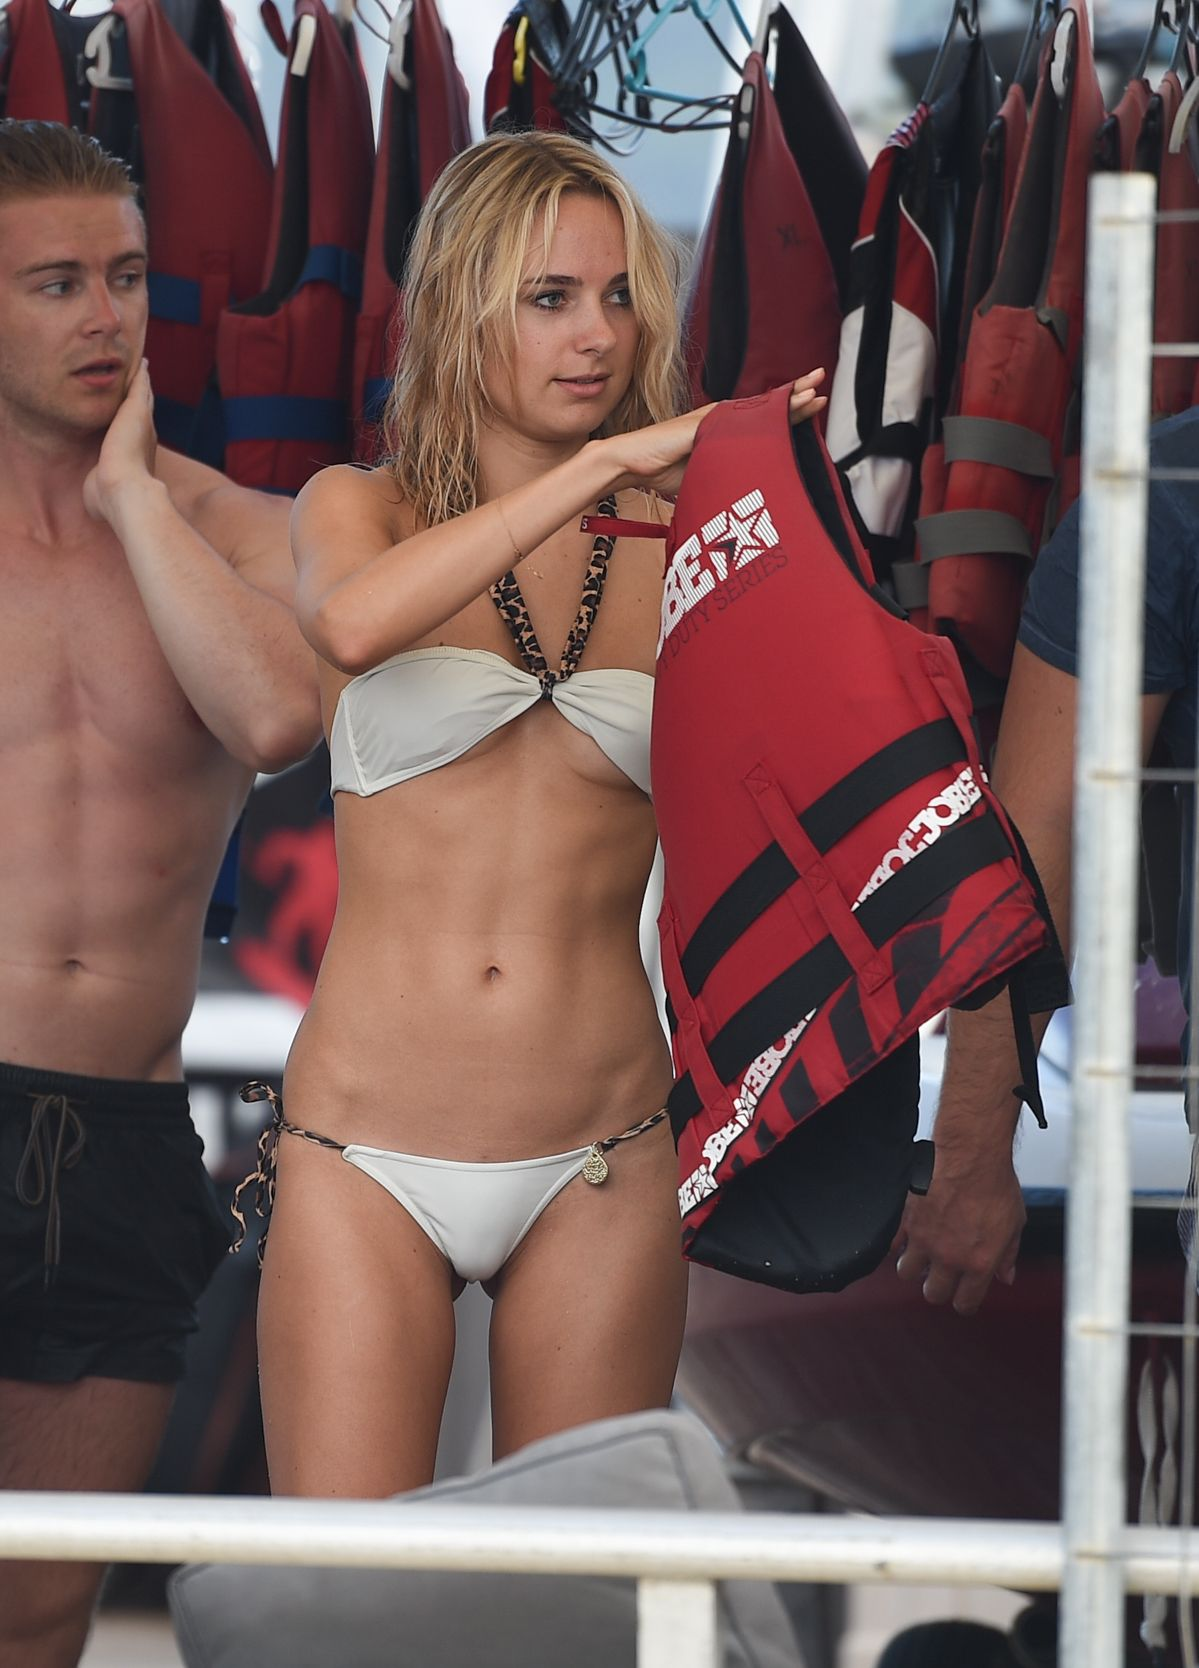 kimberly-garner-white-bikini-cameltoe-st-tropez-33